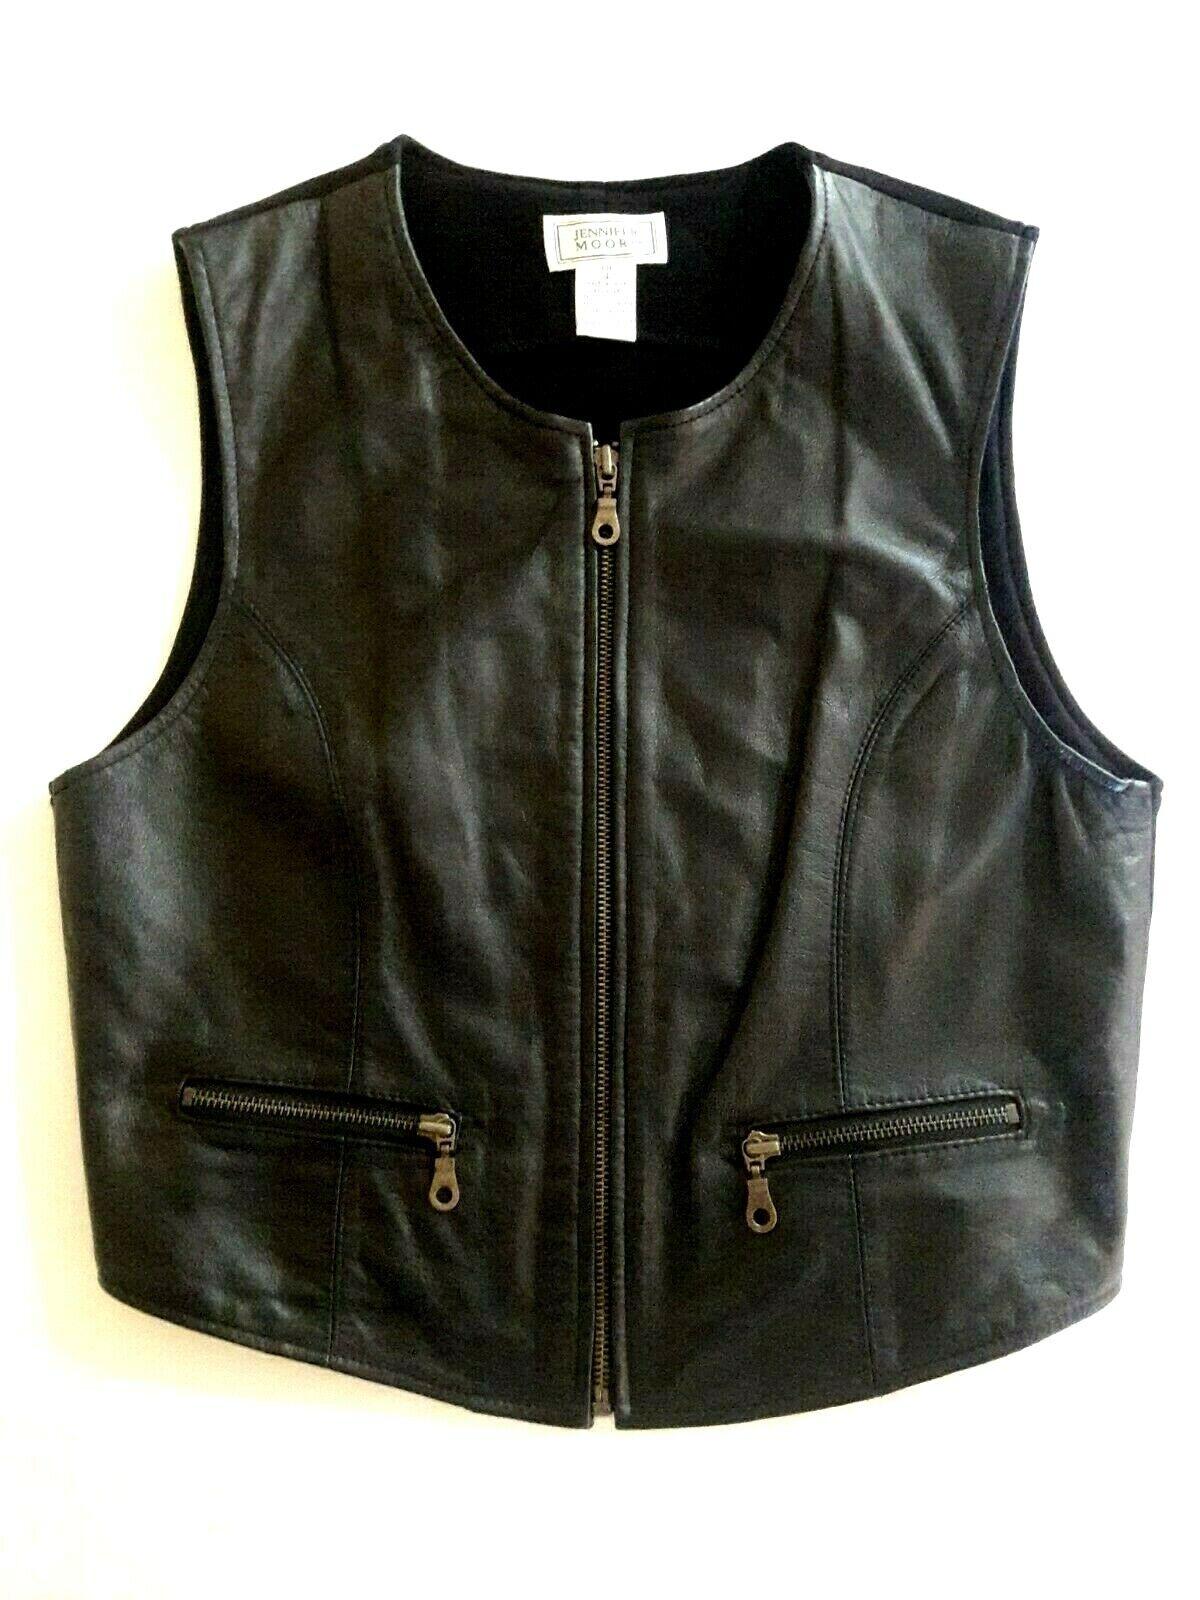 Vintage black genuine leather vest womens size 4 zip front brass hardware